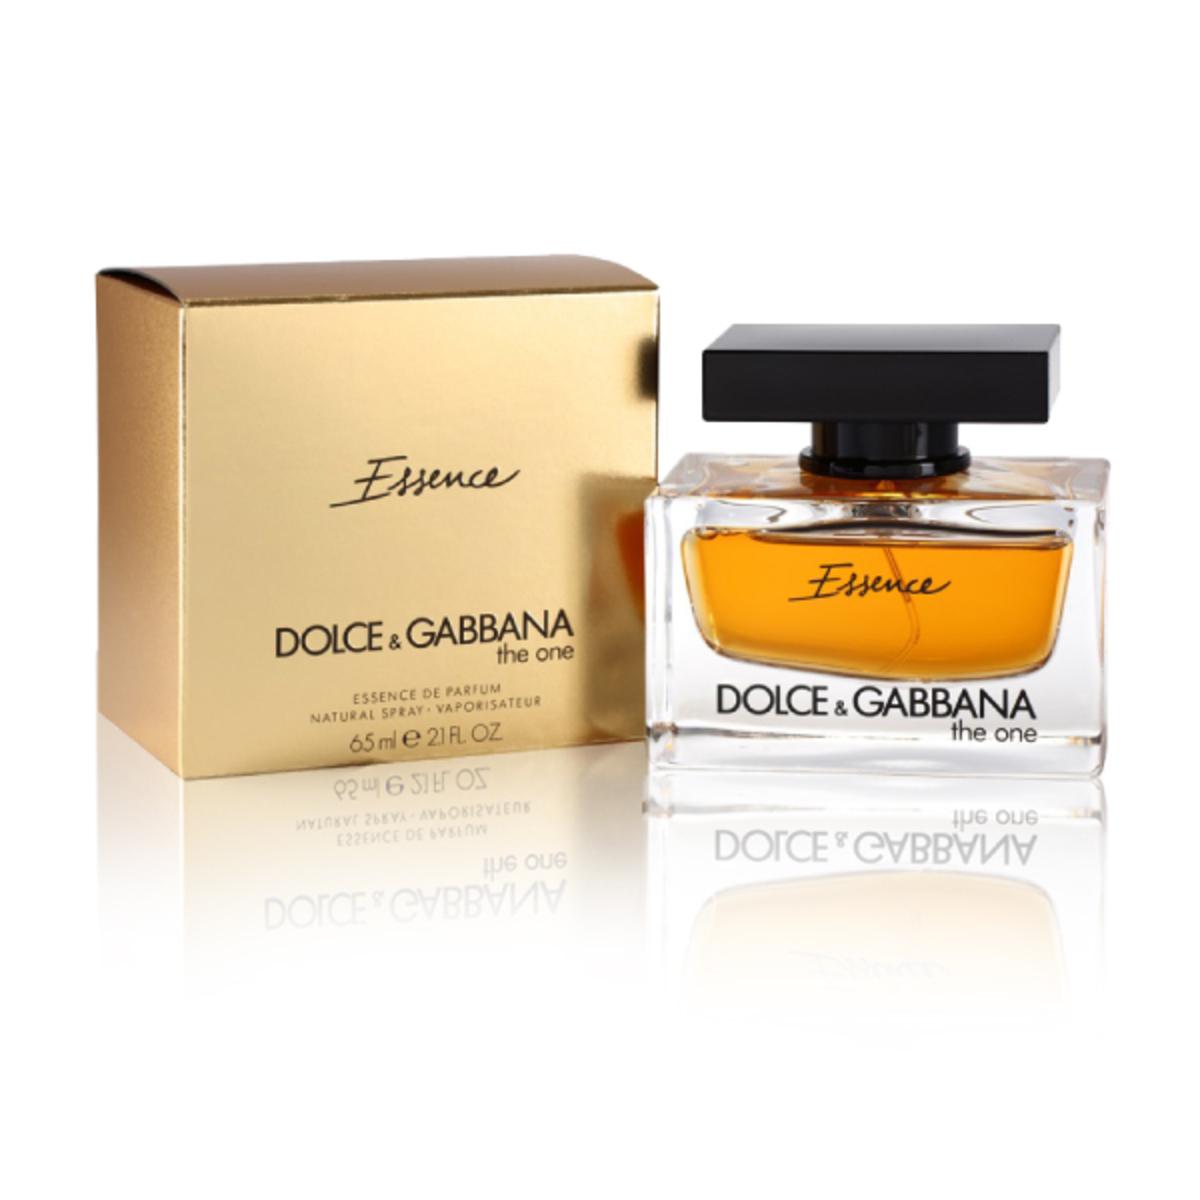 DOLCE and GABBANA The One Essence Eau de Parfum Spray for Women 65ml ... 1a3c10ffebd1